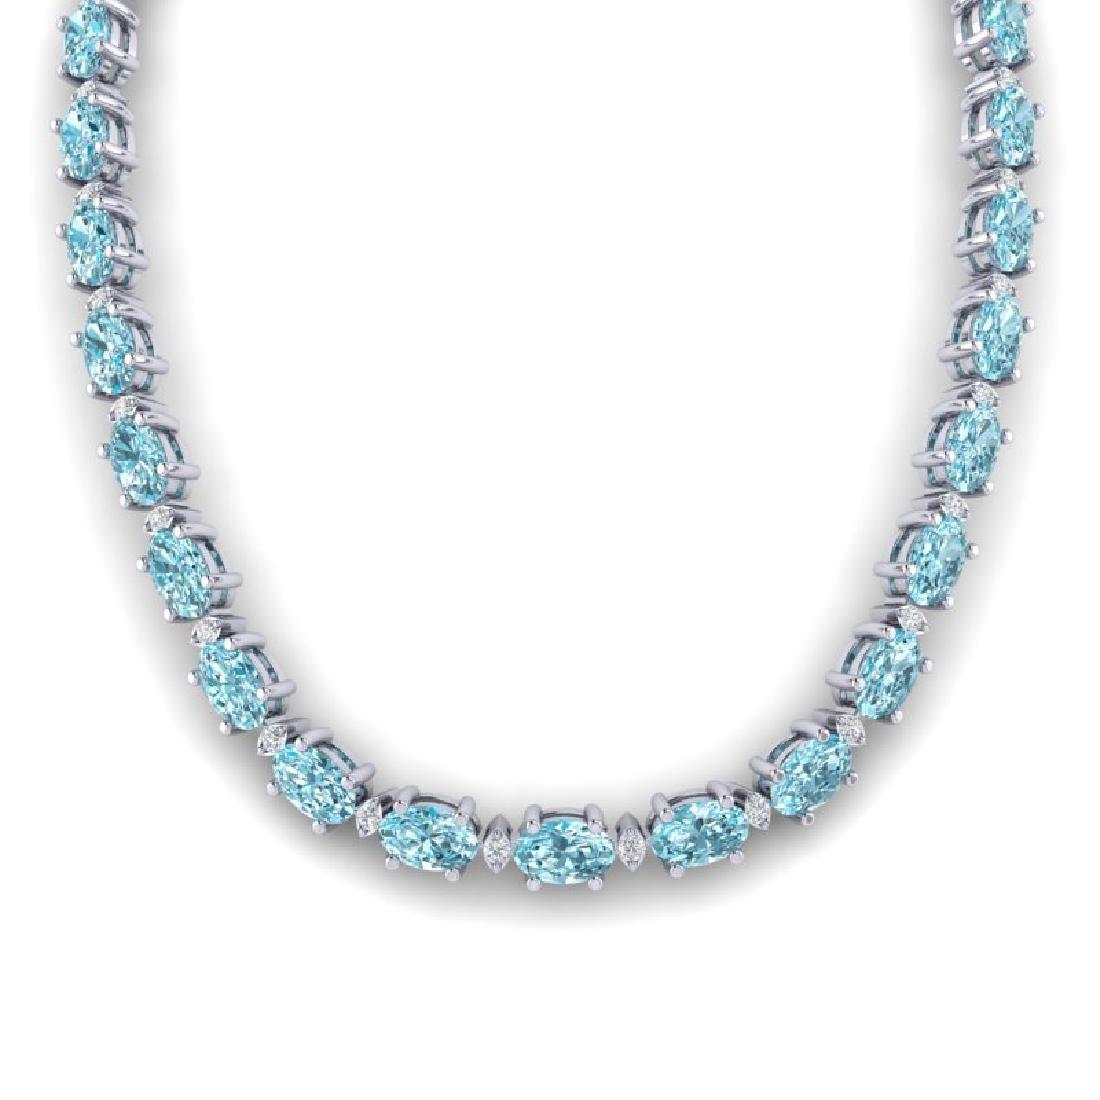 34 CTW Sky Blue Topaz & VS/SI Diamond Tennis Necklace - 3